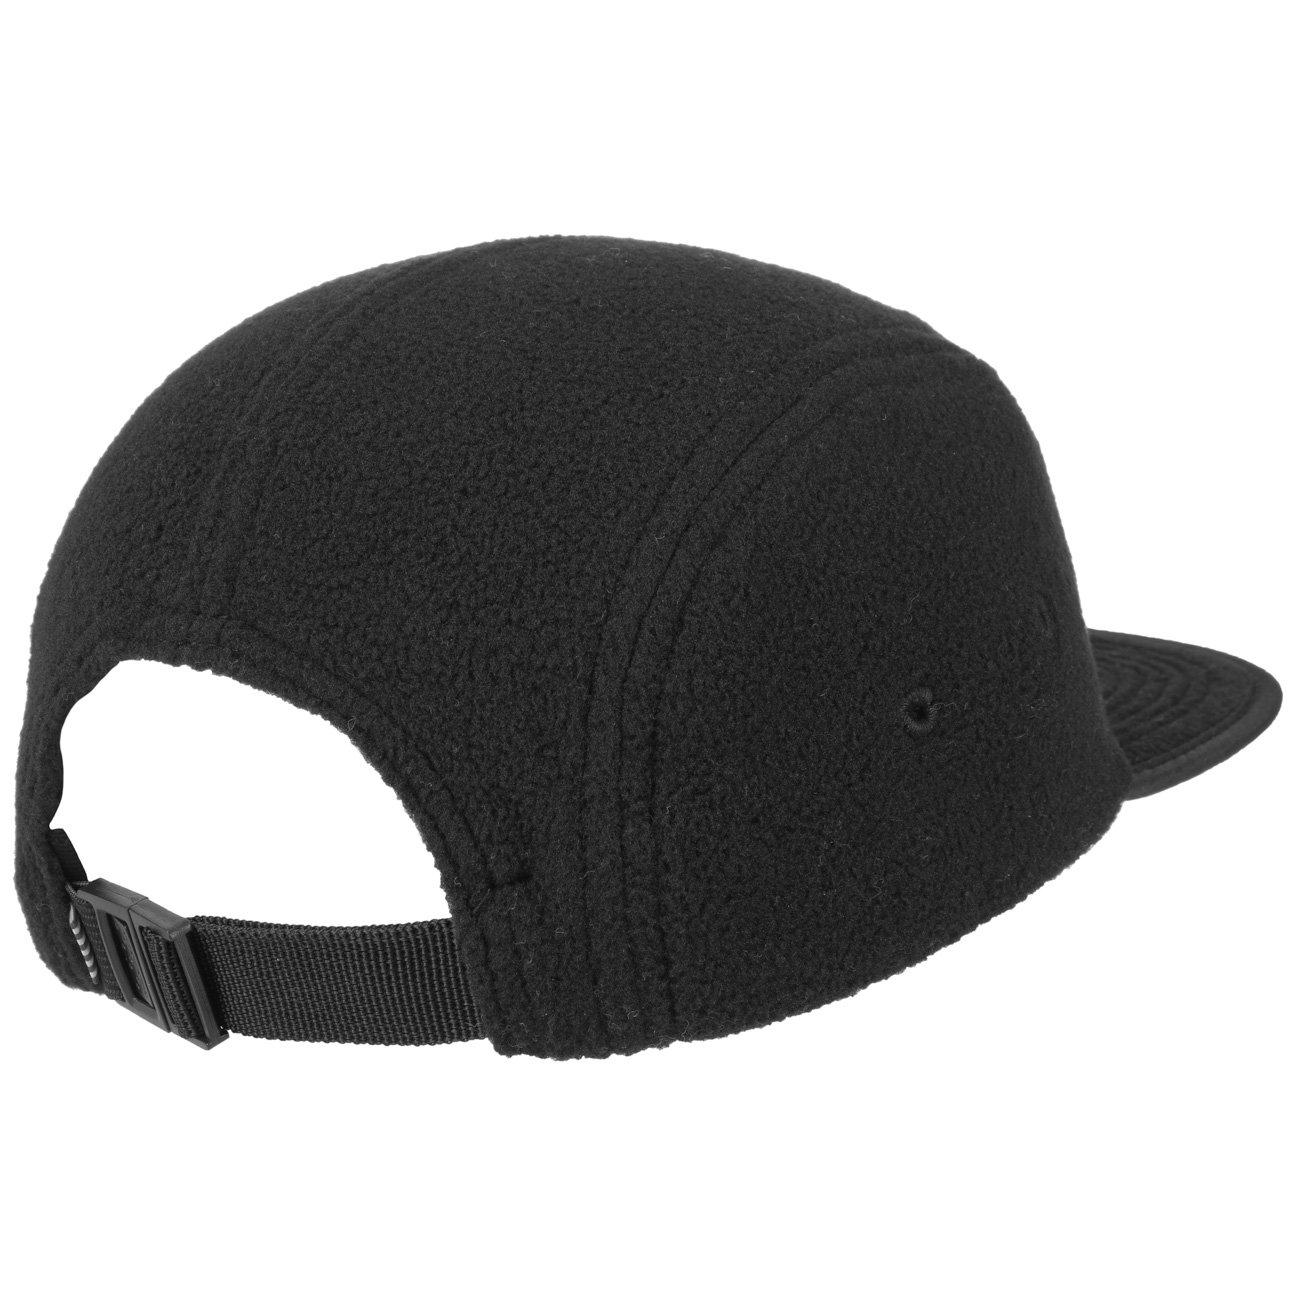 dcb73e6037d955 Herschel Glendale Polar Fleece Cap base cap baseball cap (One Size - black):  Amazon.co.uk: Clothing